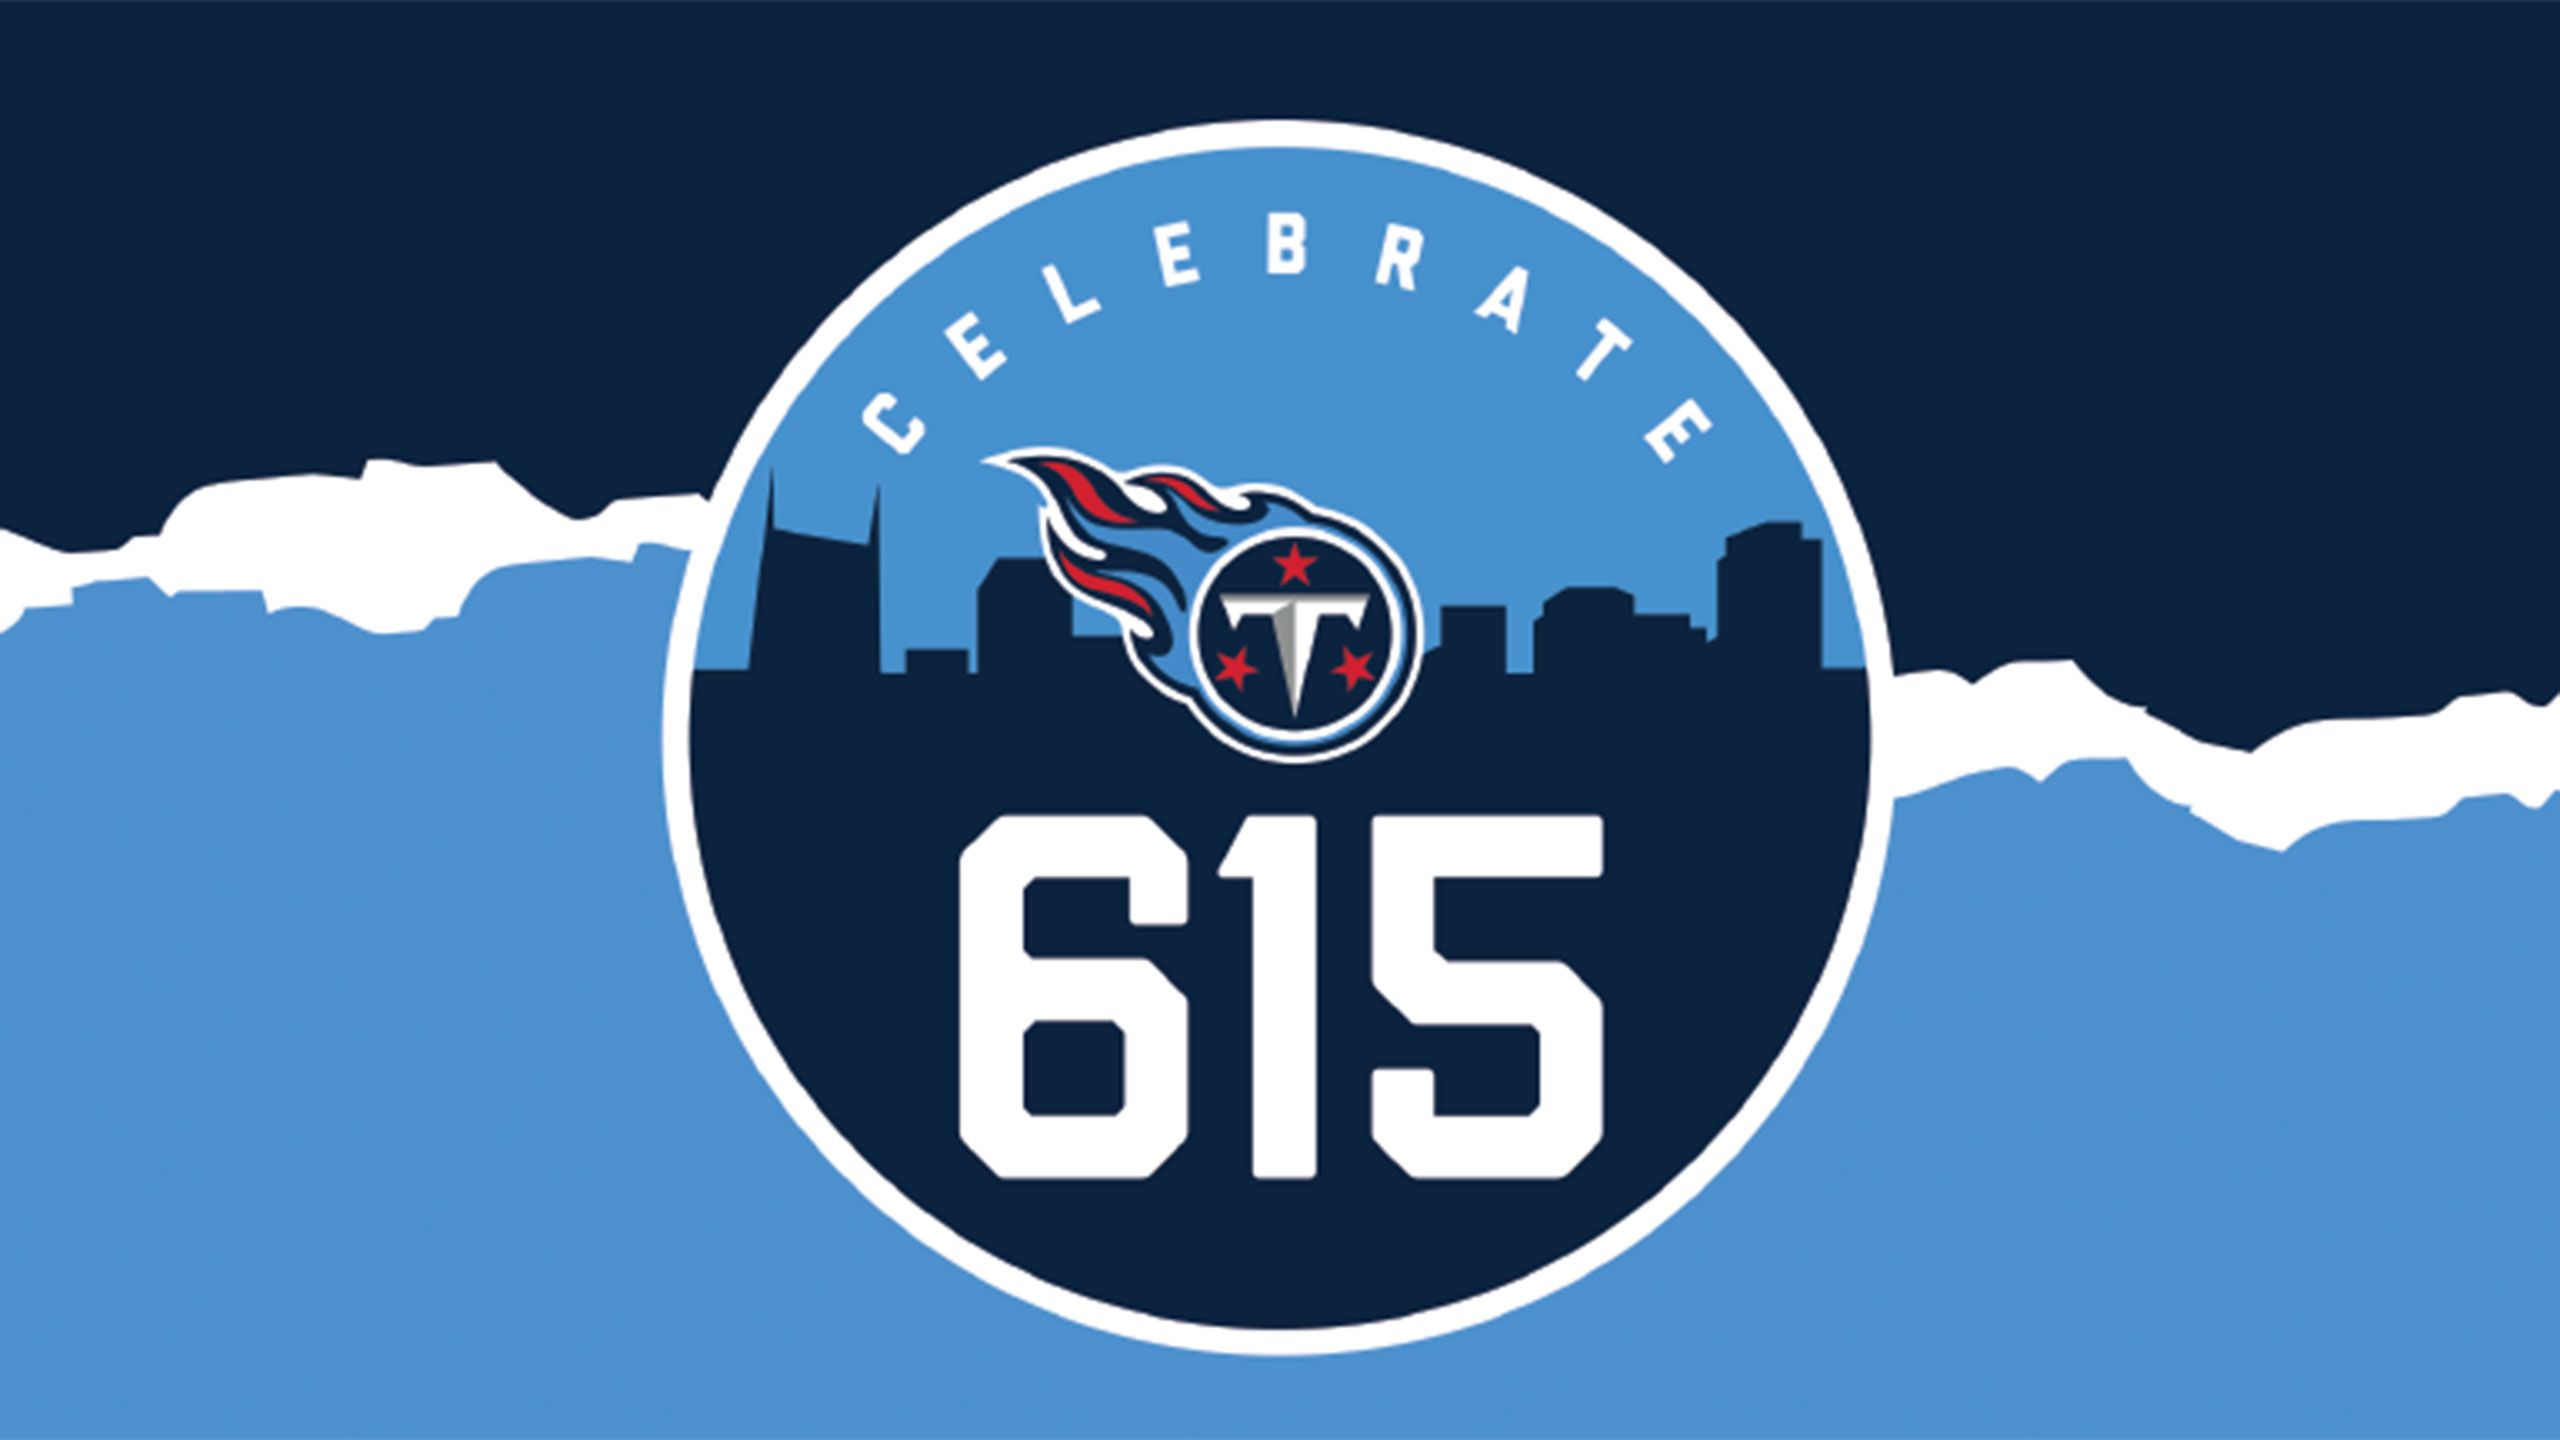 Celebrate 615